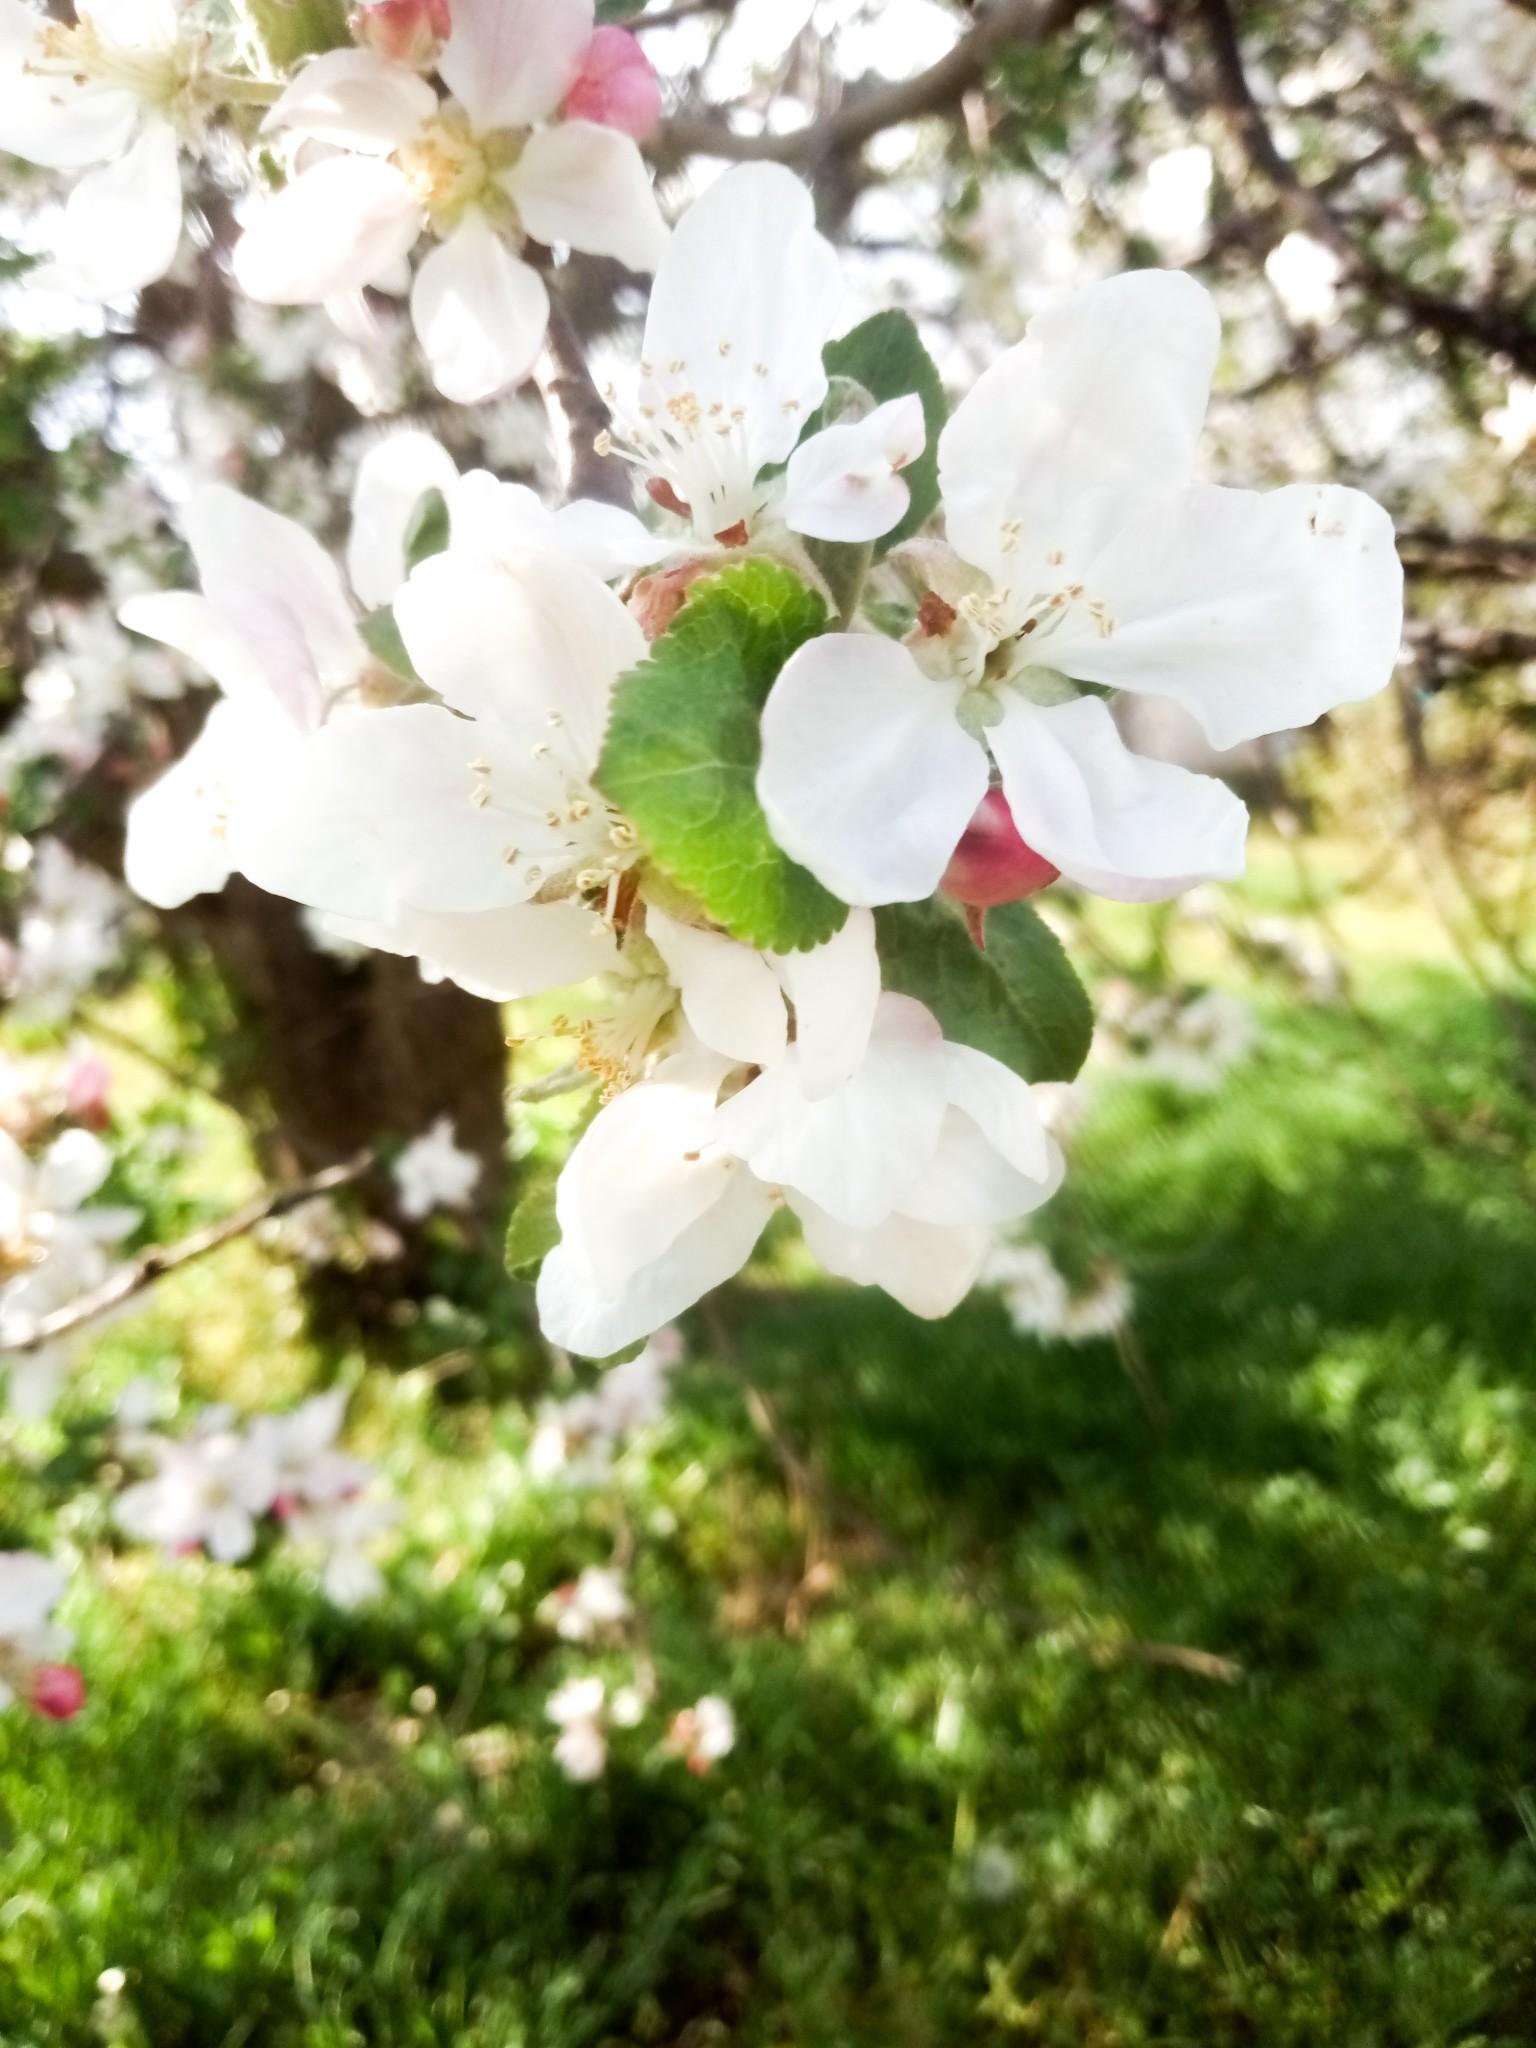 flowering apple tree - beautiful picture